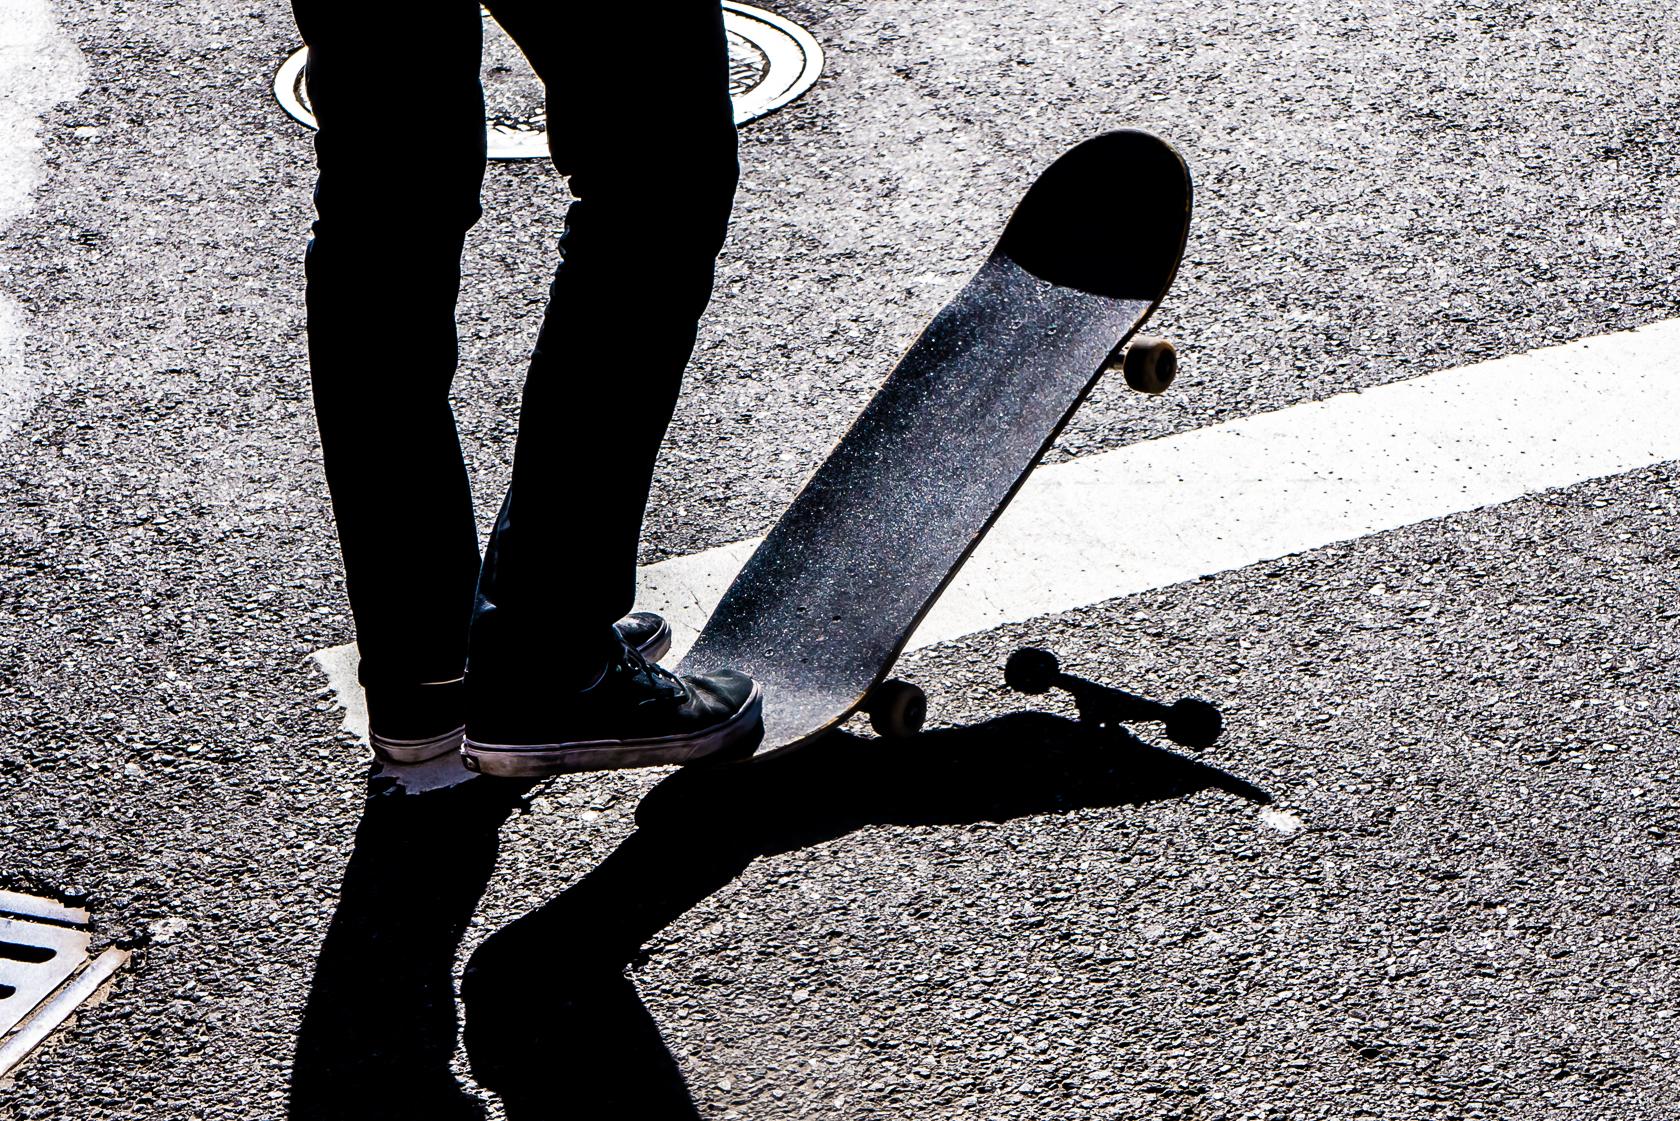 skateboard-1000645